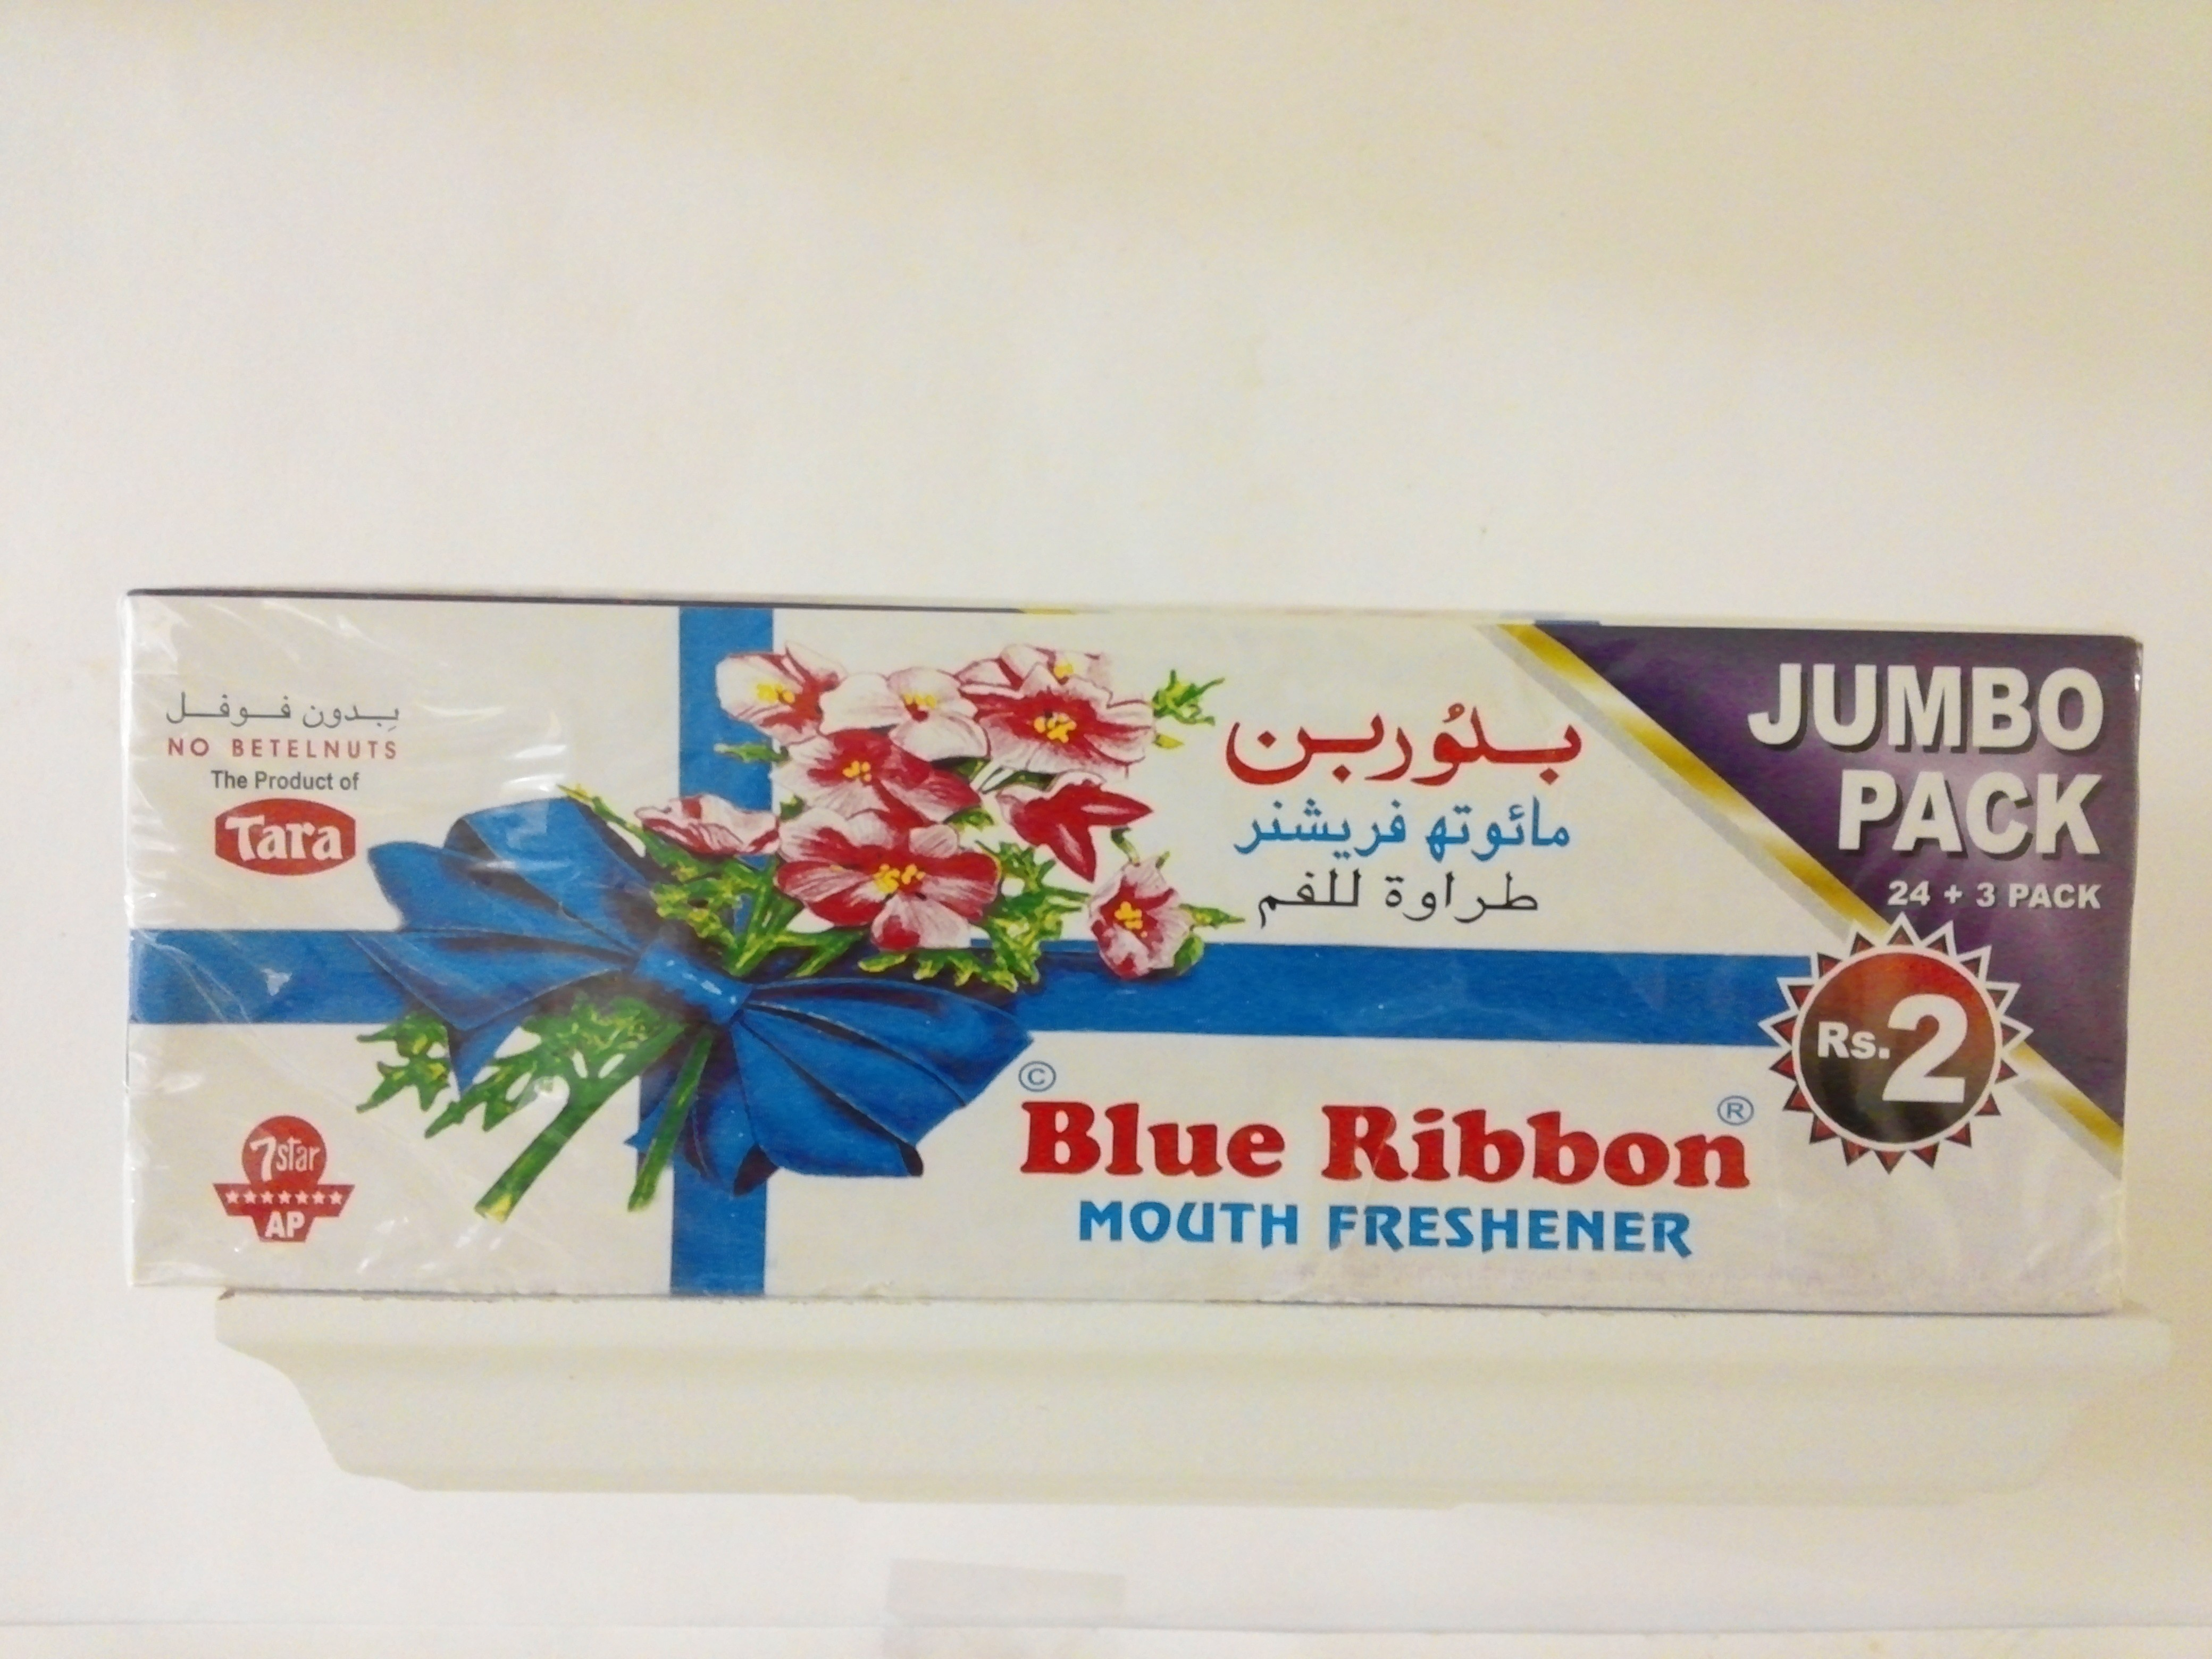 Blue Ribbon Mouth Freshener 24 Packs